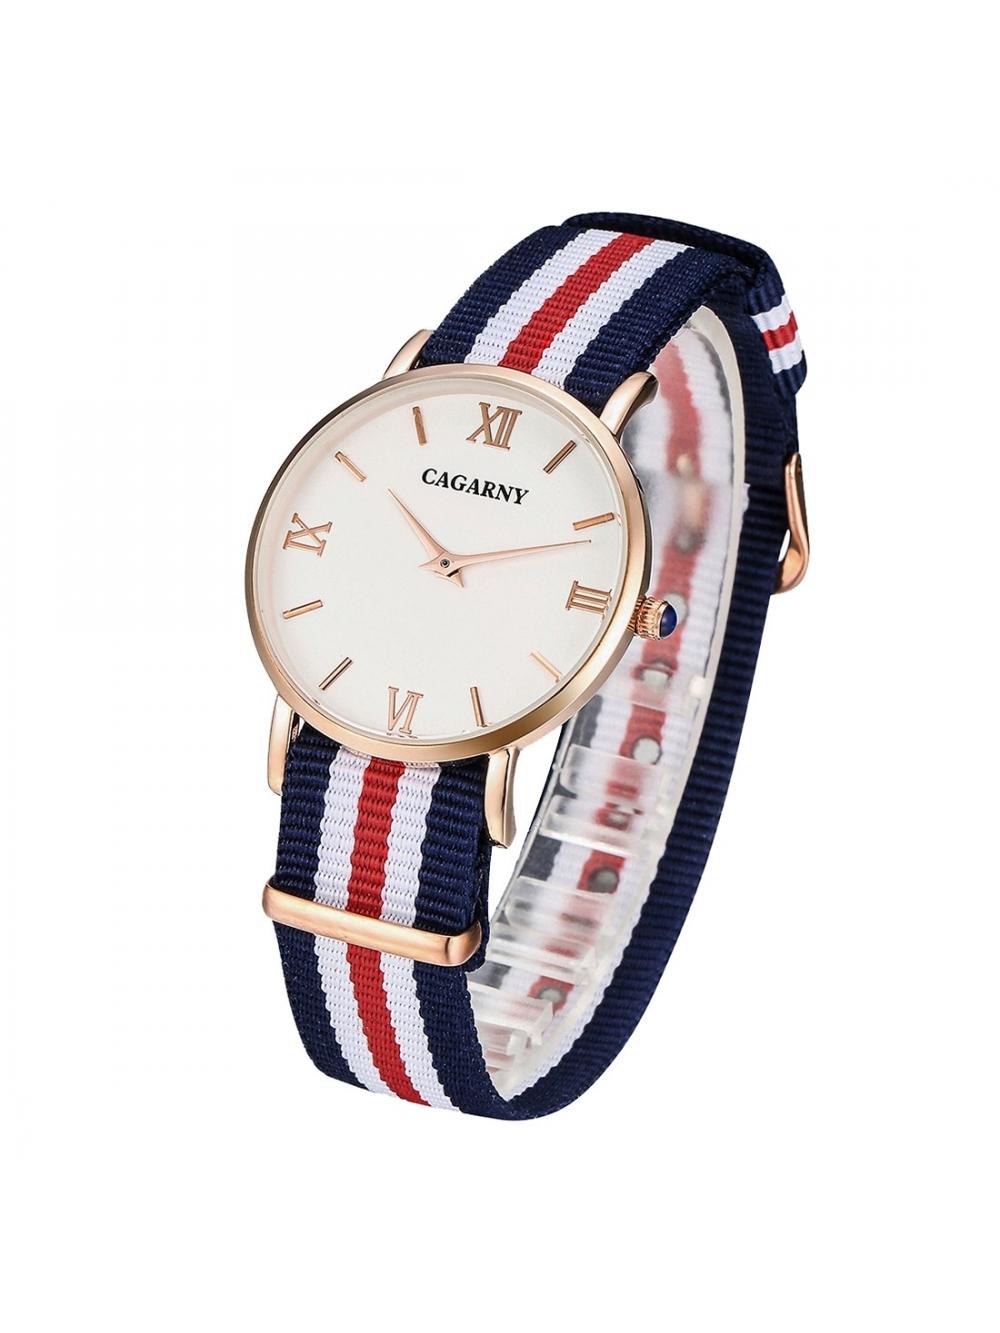 8d80372ff Pánske módne hodinky C010- silver -grey. Loading zoom